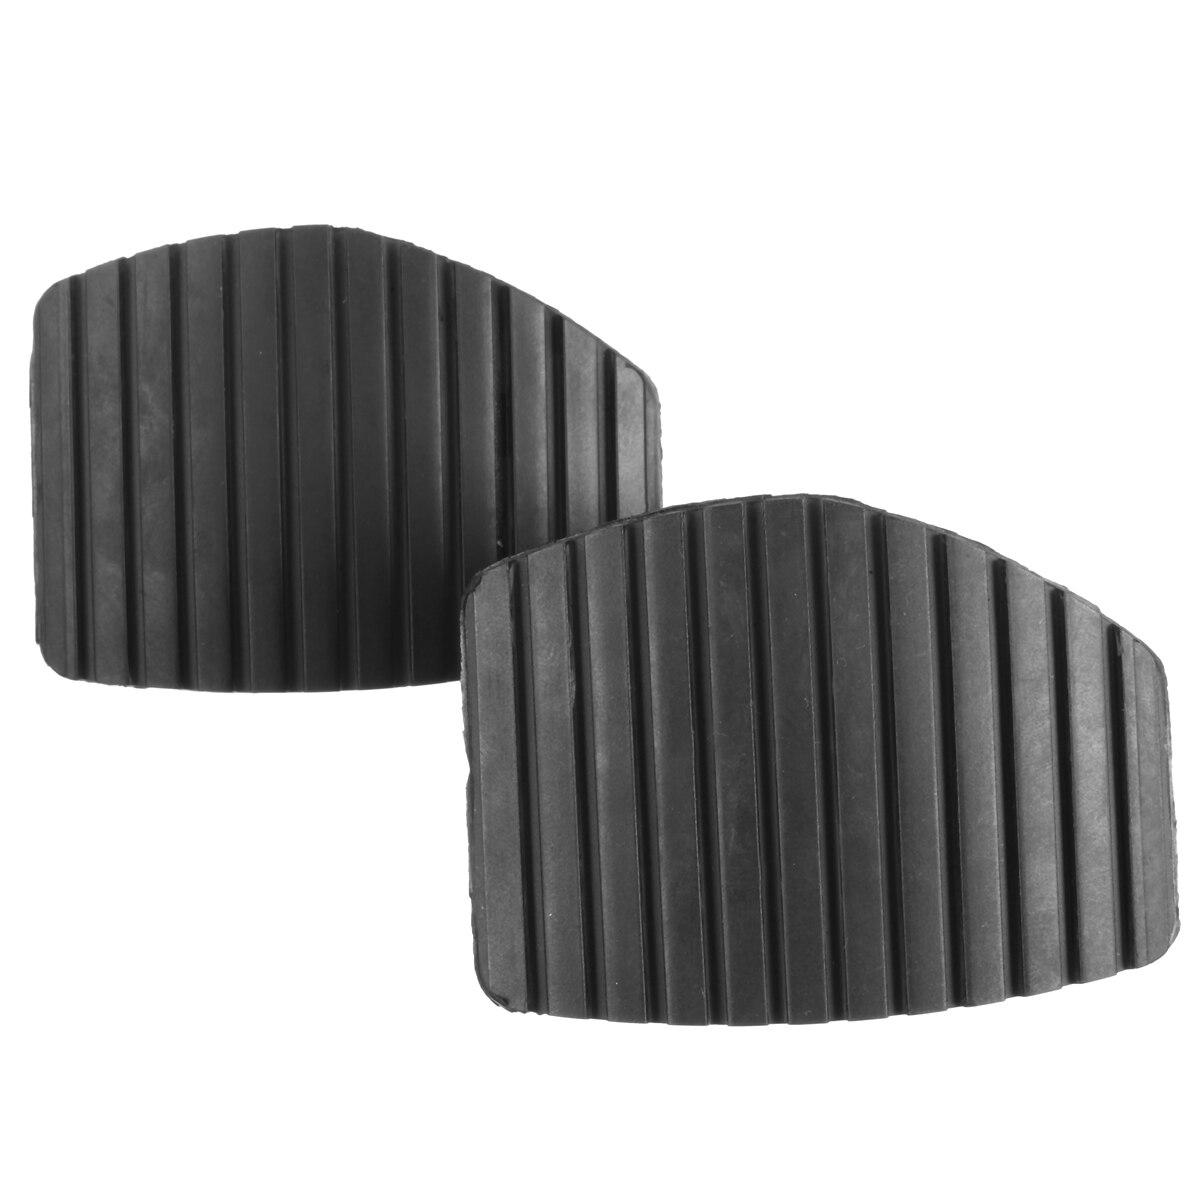 Dibiao One Pair Car Clutch Brake Pedal Rubber Pad Cover for Auto Peugeot//Citroen 1007 207 208 301 C3 C4 C5 C6 C8